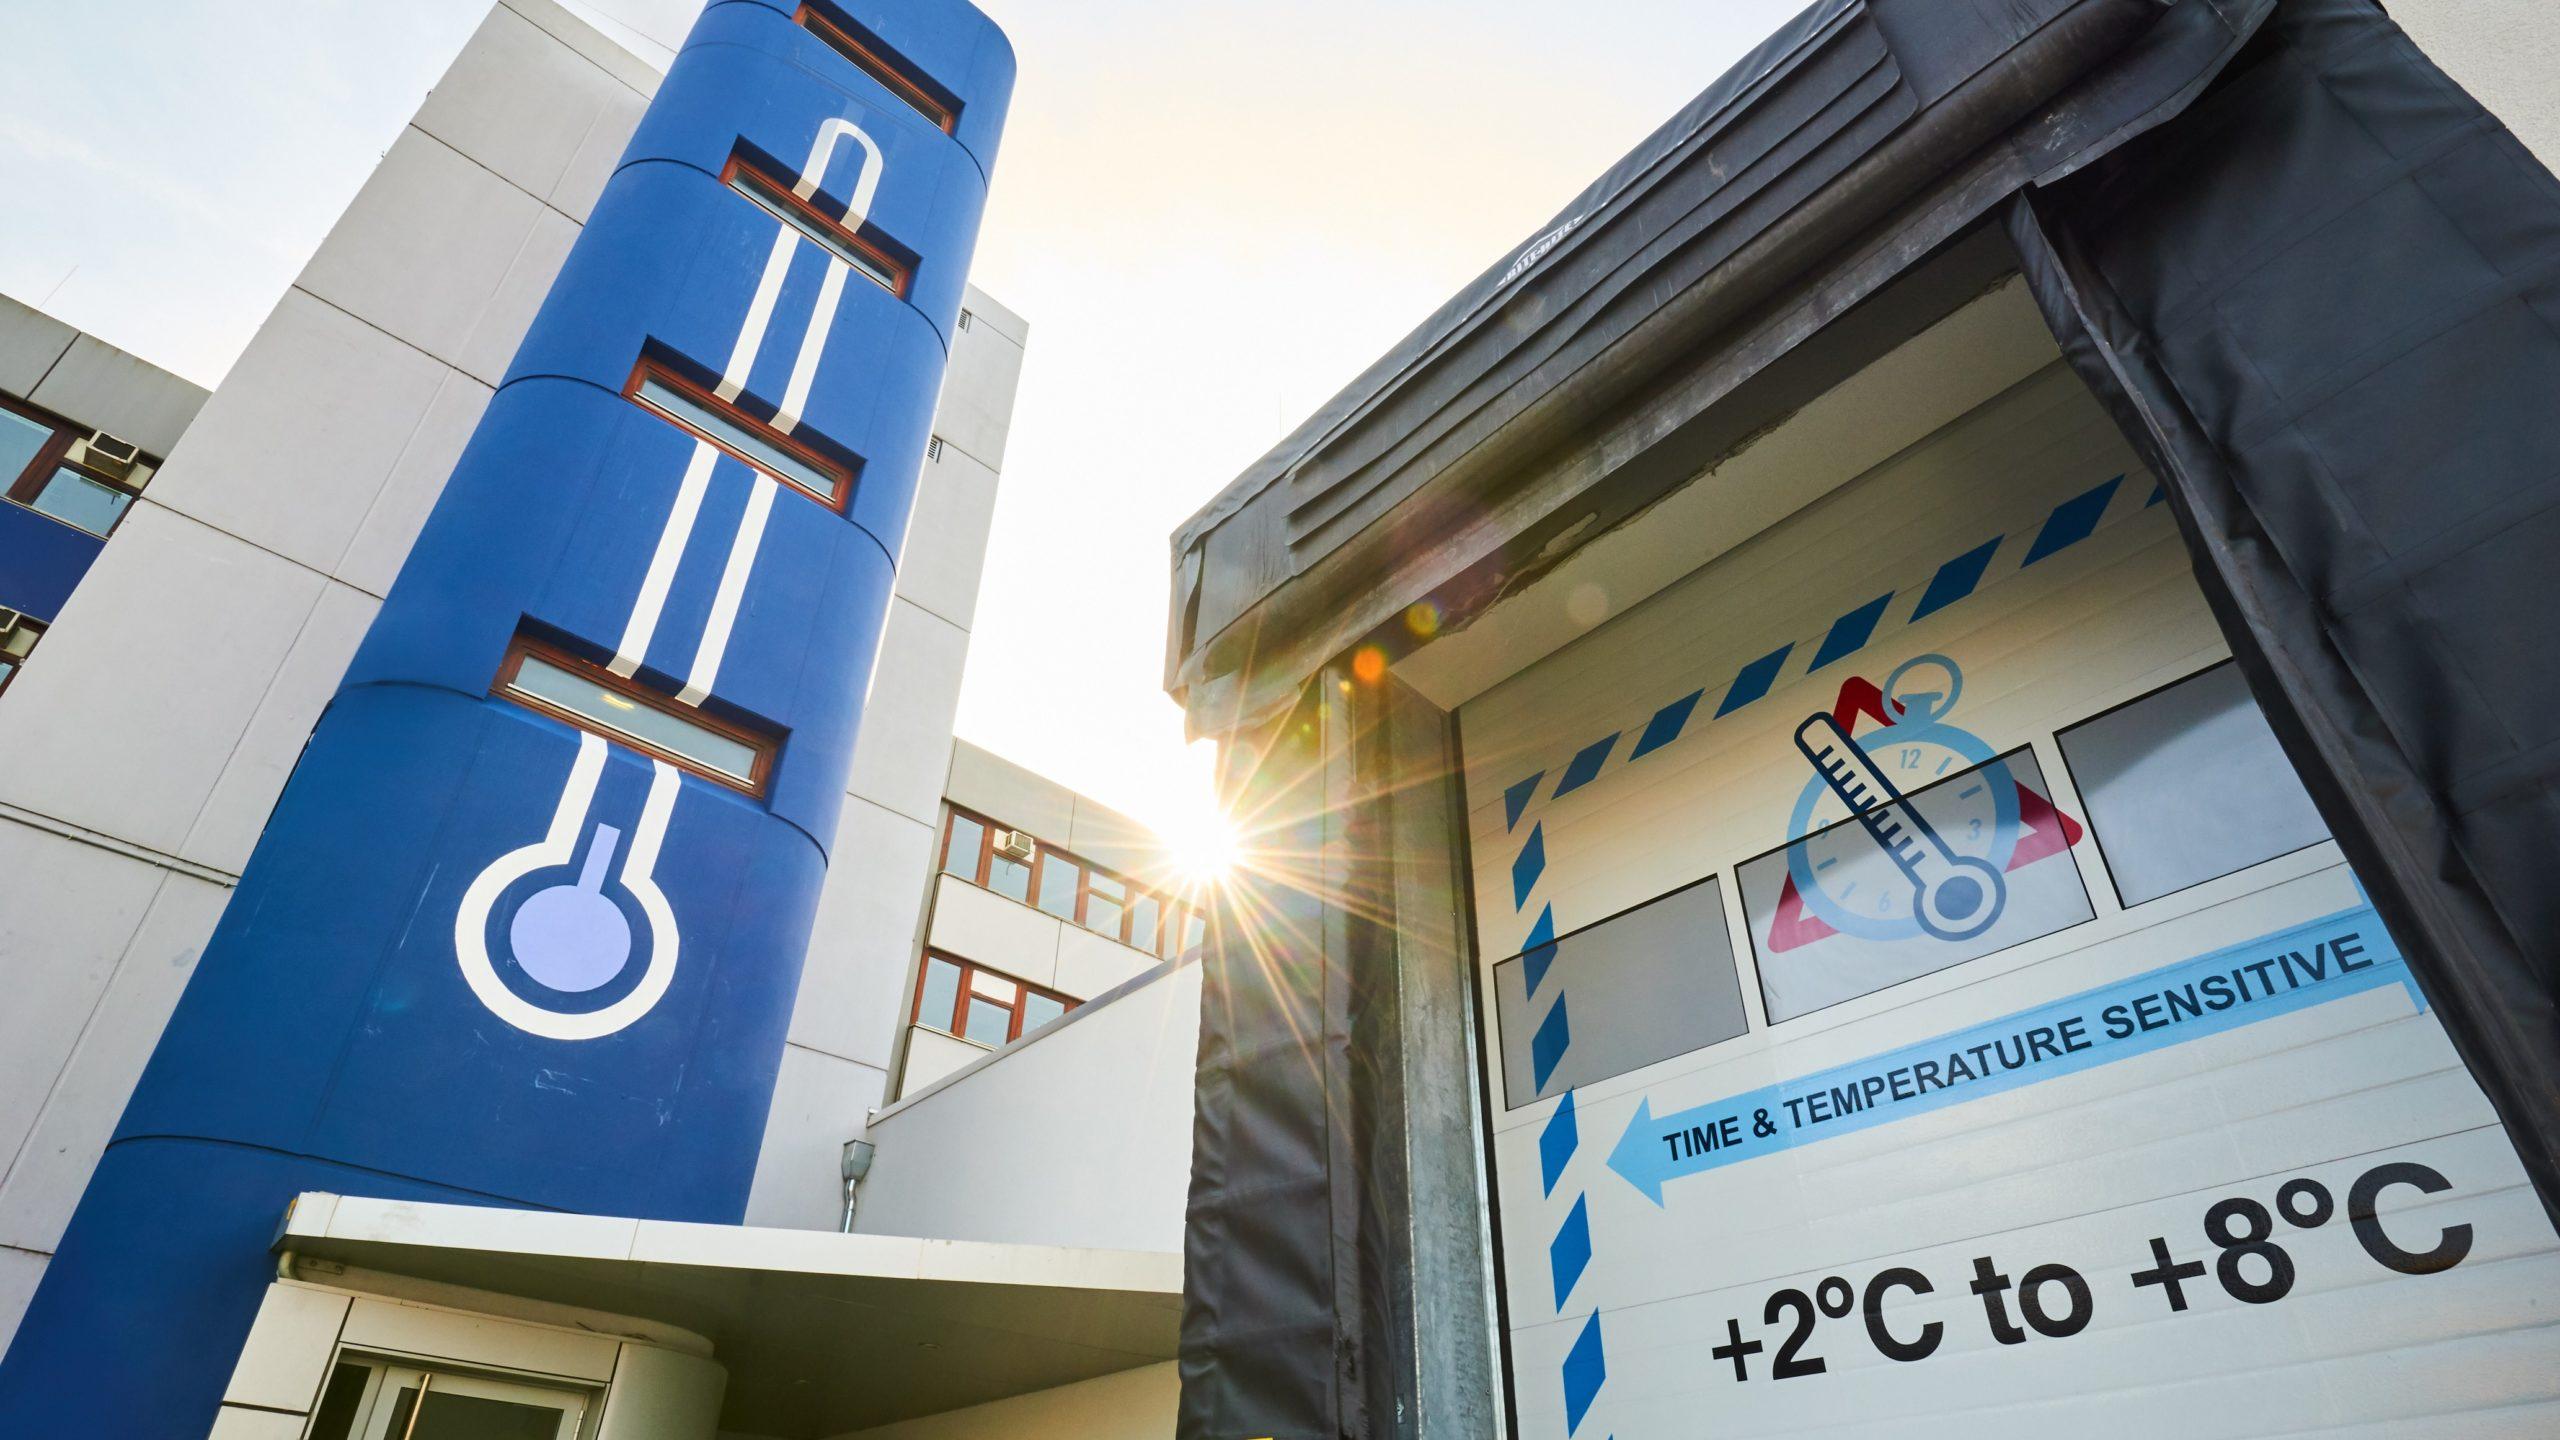 Pharma-Hub Frankfurt Airport is leading European hub for handling of temperature-sensitive goods